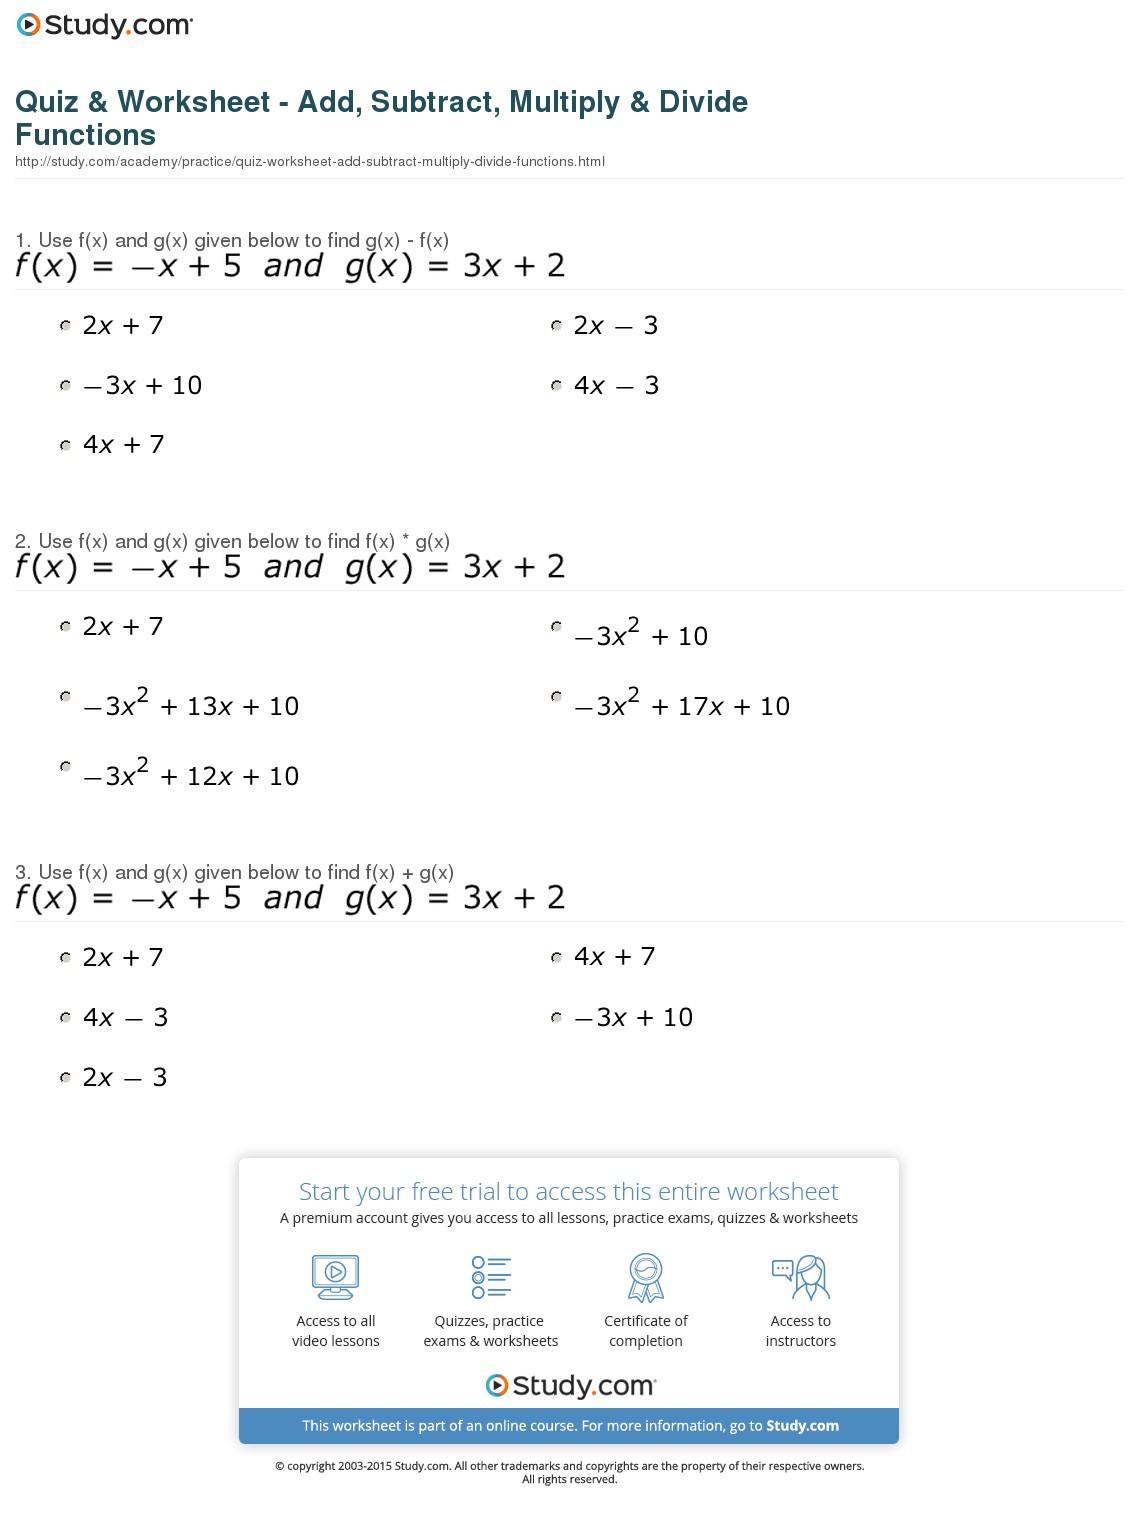 Quiz Worksheet Add Subtract Multiply Divide